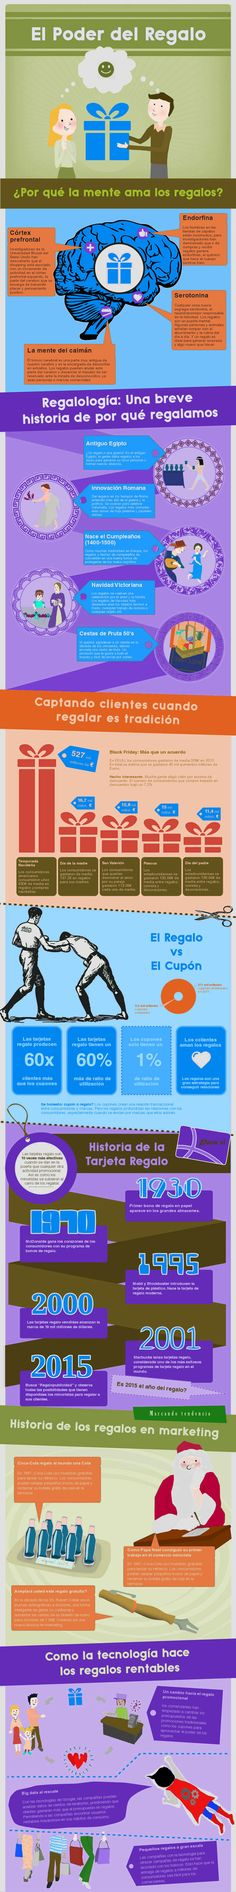 Evolución e impacto de los regalos como estrategia de marketing #infografia #marketing